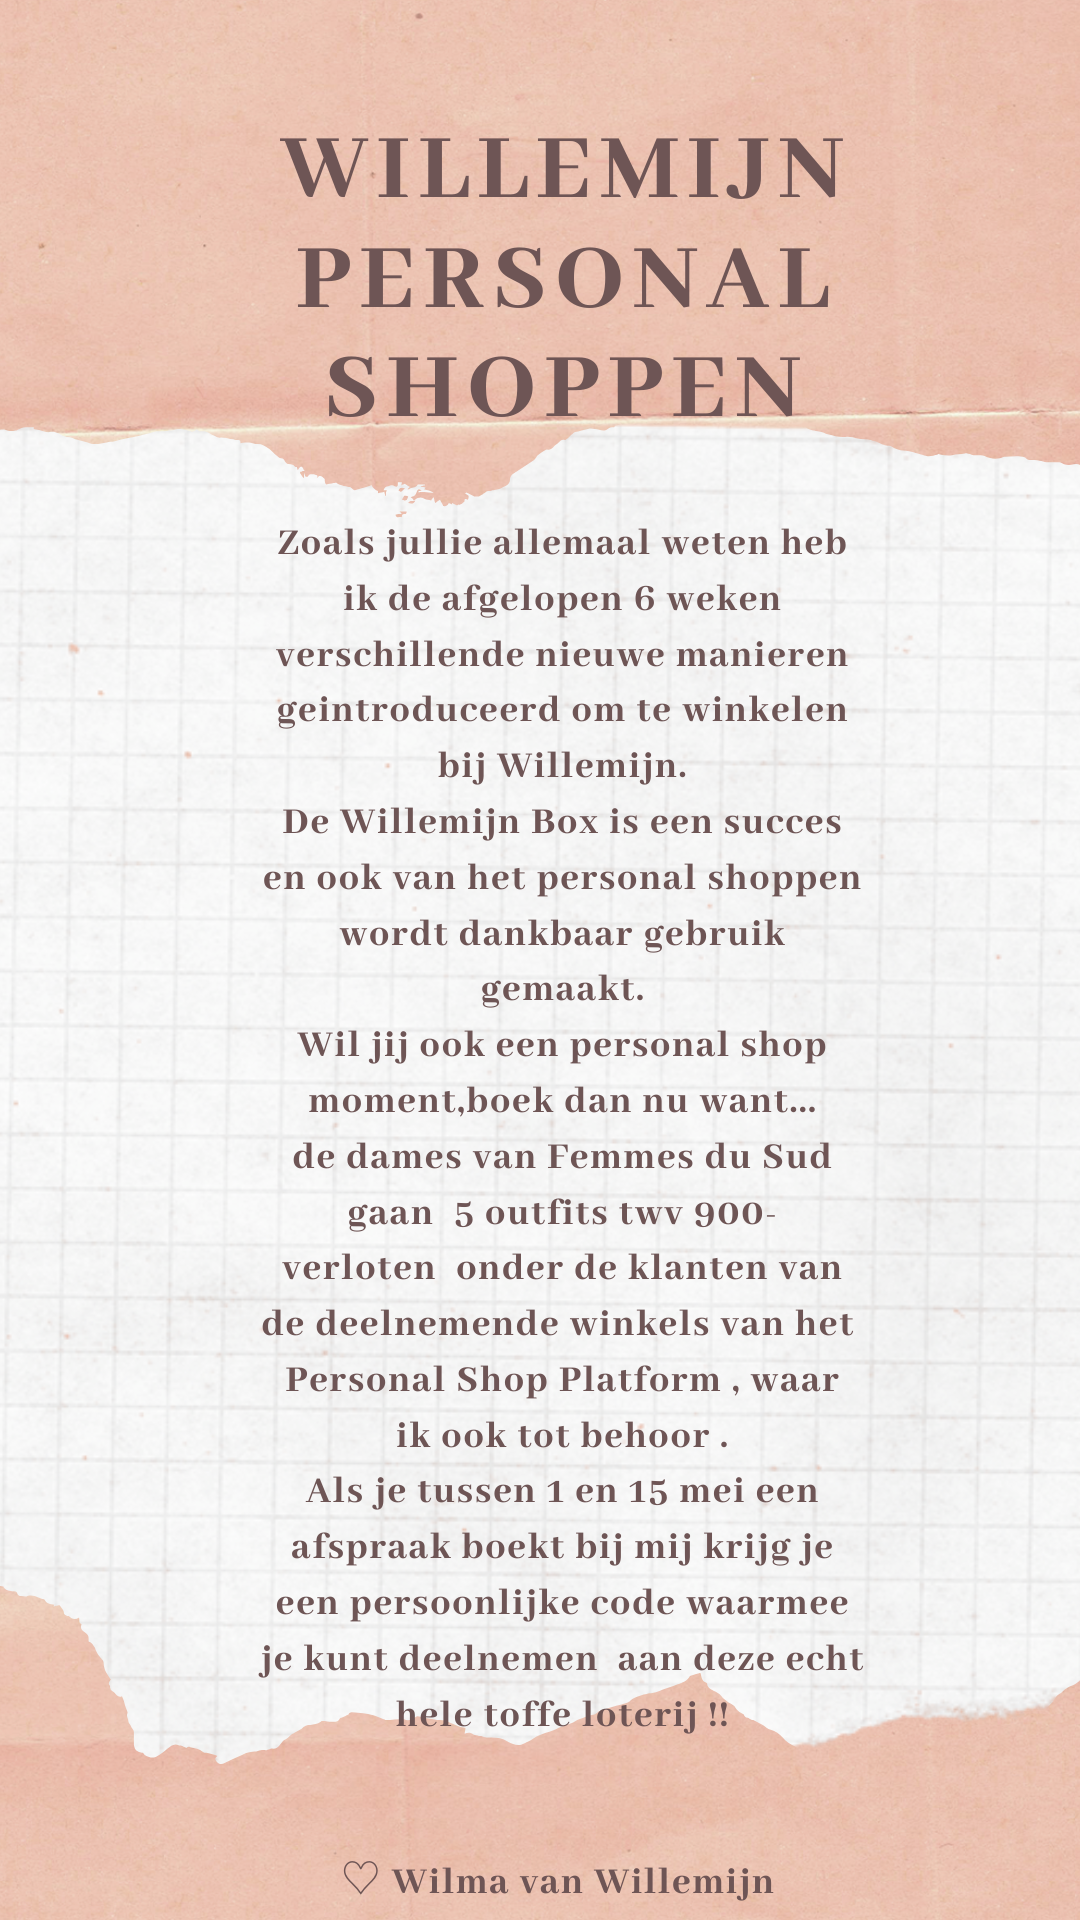 personal shoppen Willemijn